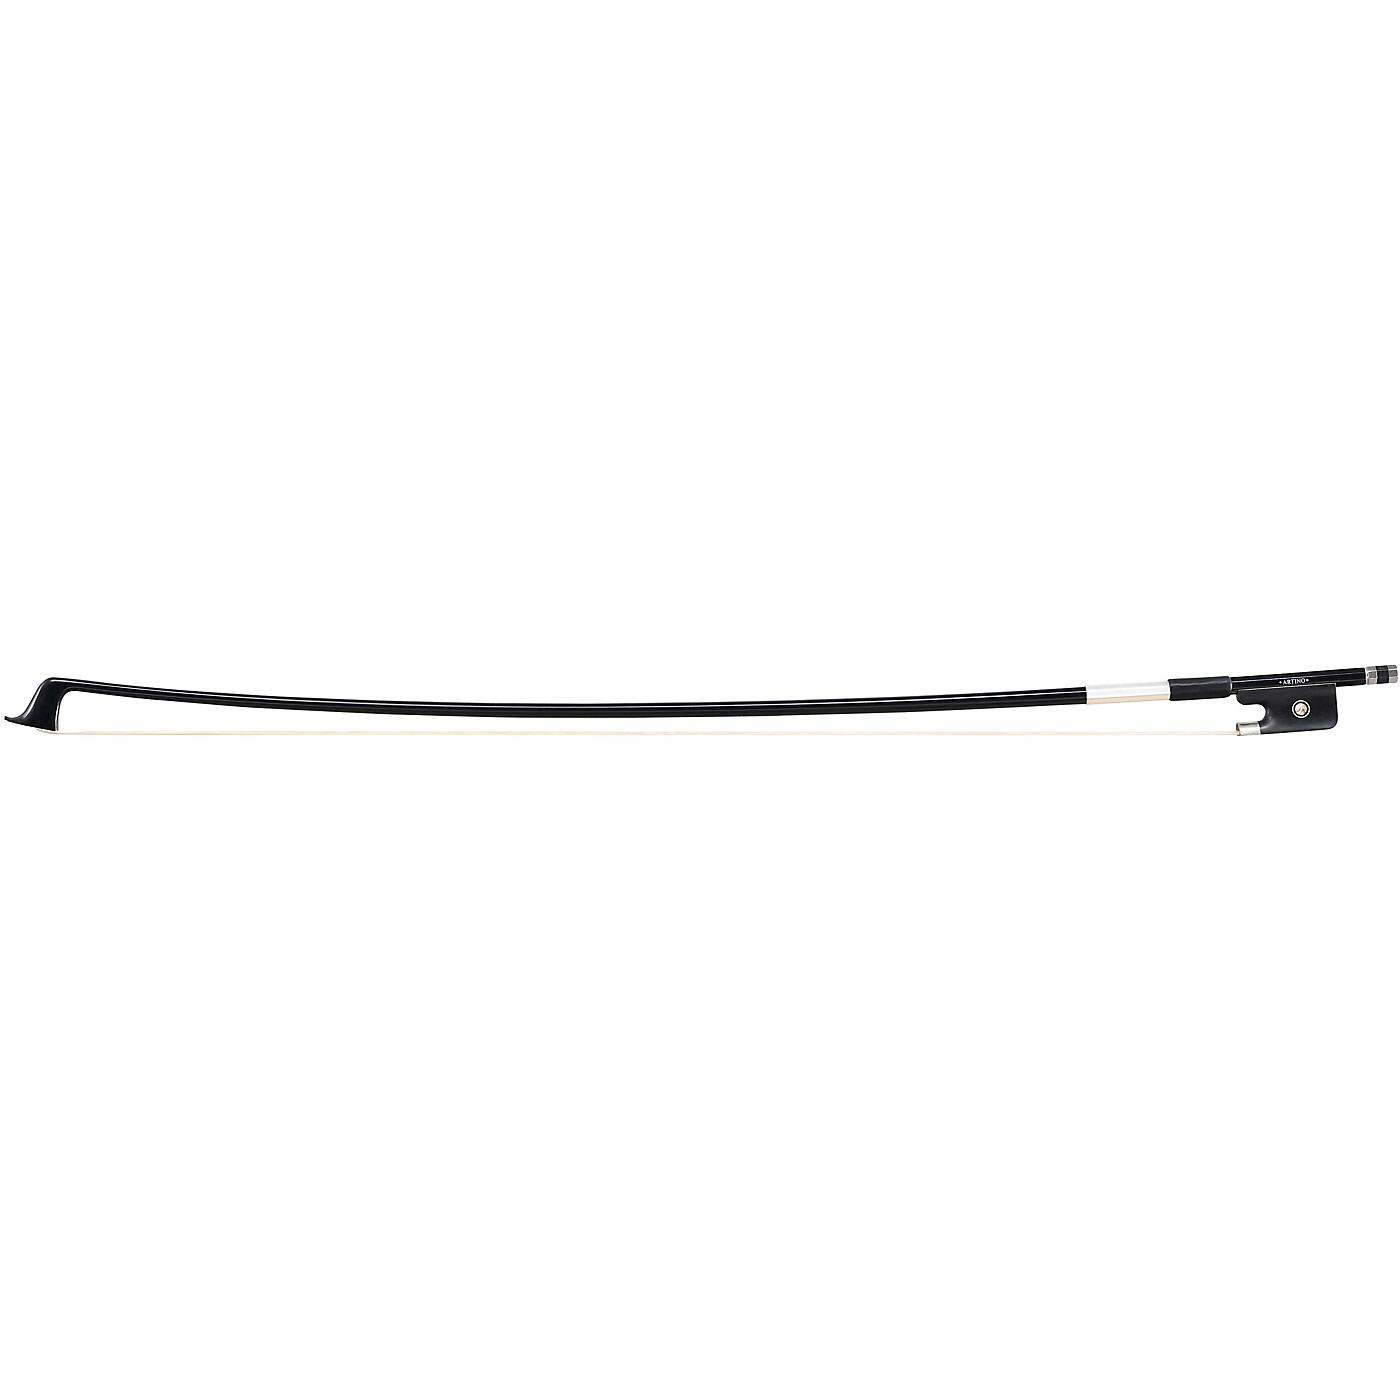 Artino Series Carbon Fiber Cello Bow thumbnail